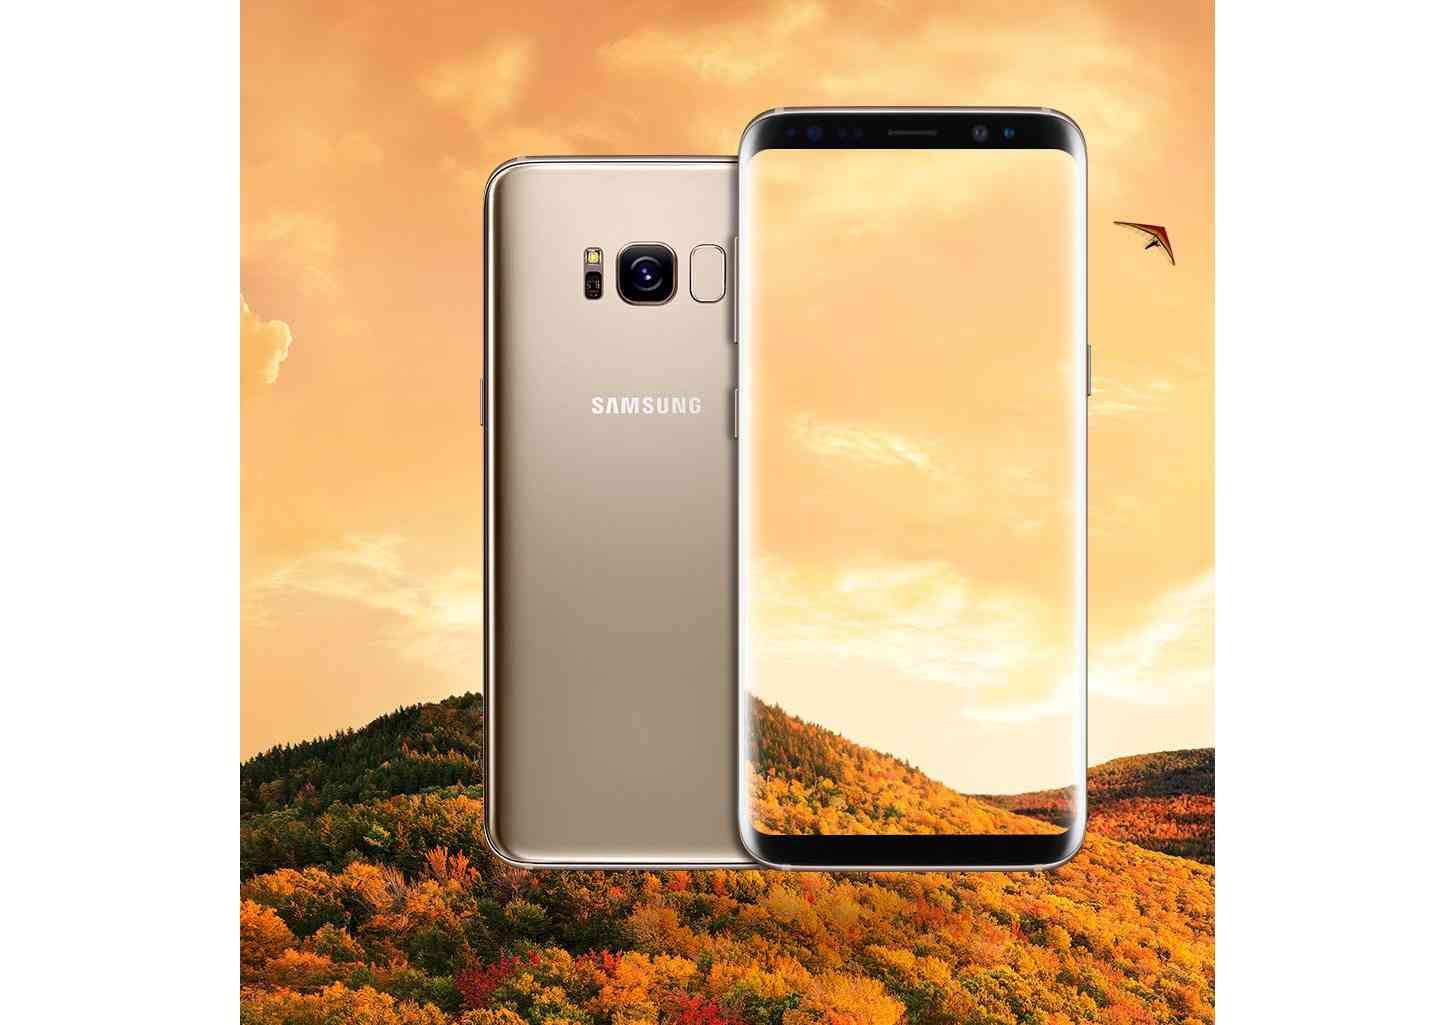 Samsung Galaxy S8 gold image leak